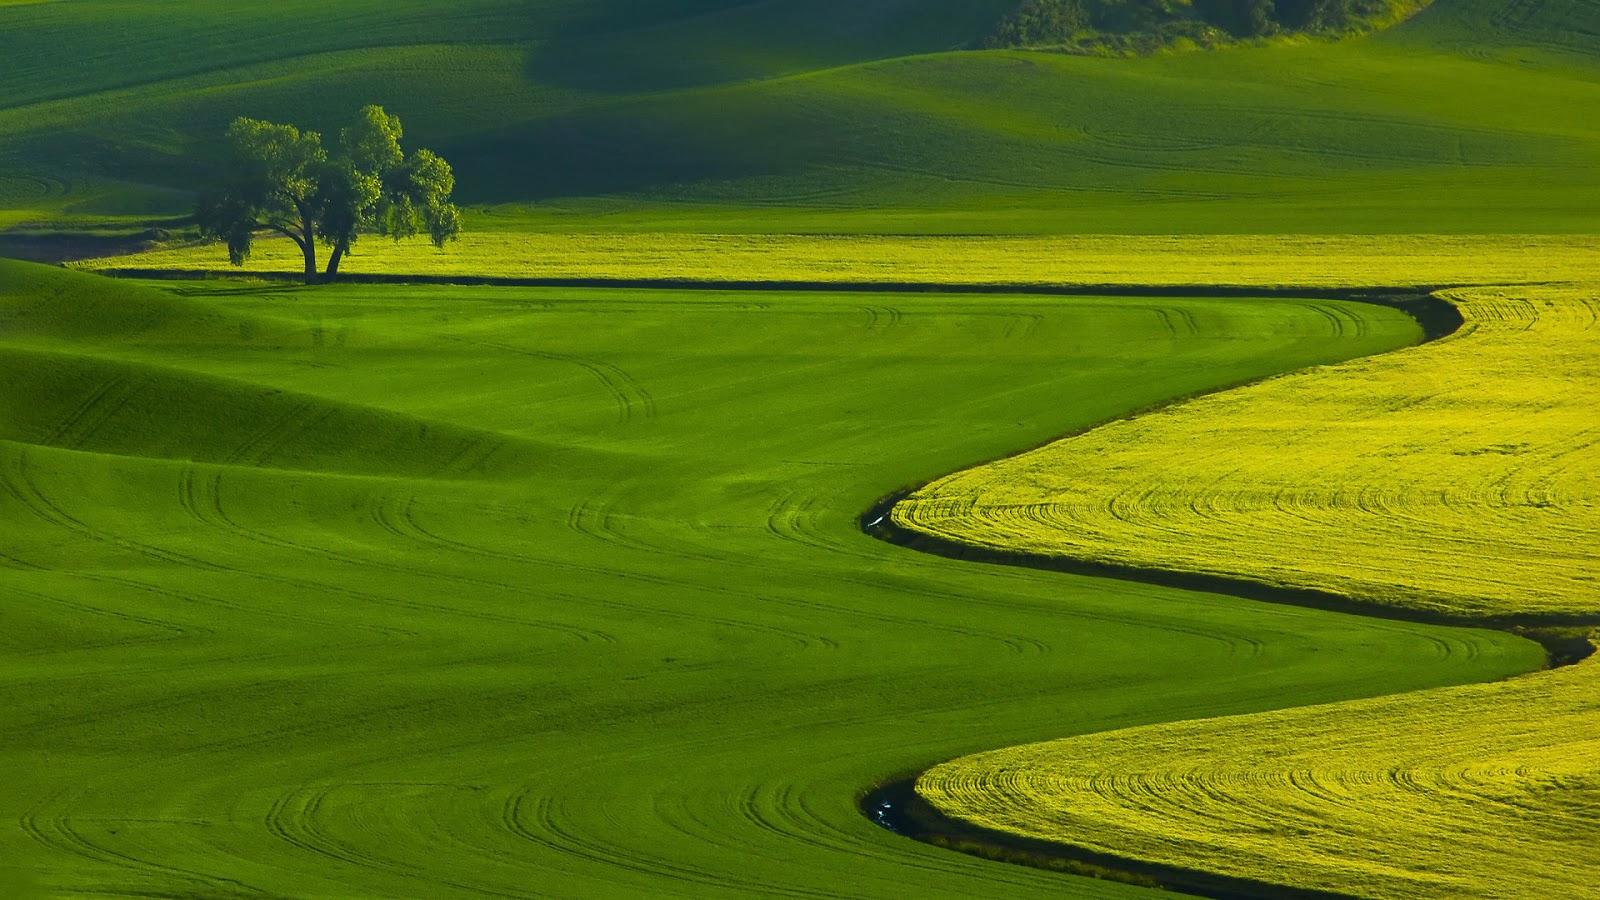 agriculture-widescreen-wallpaper